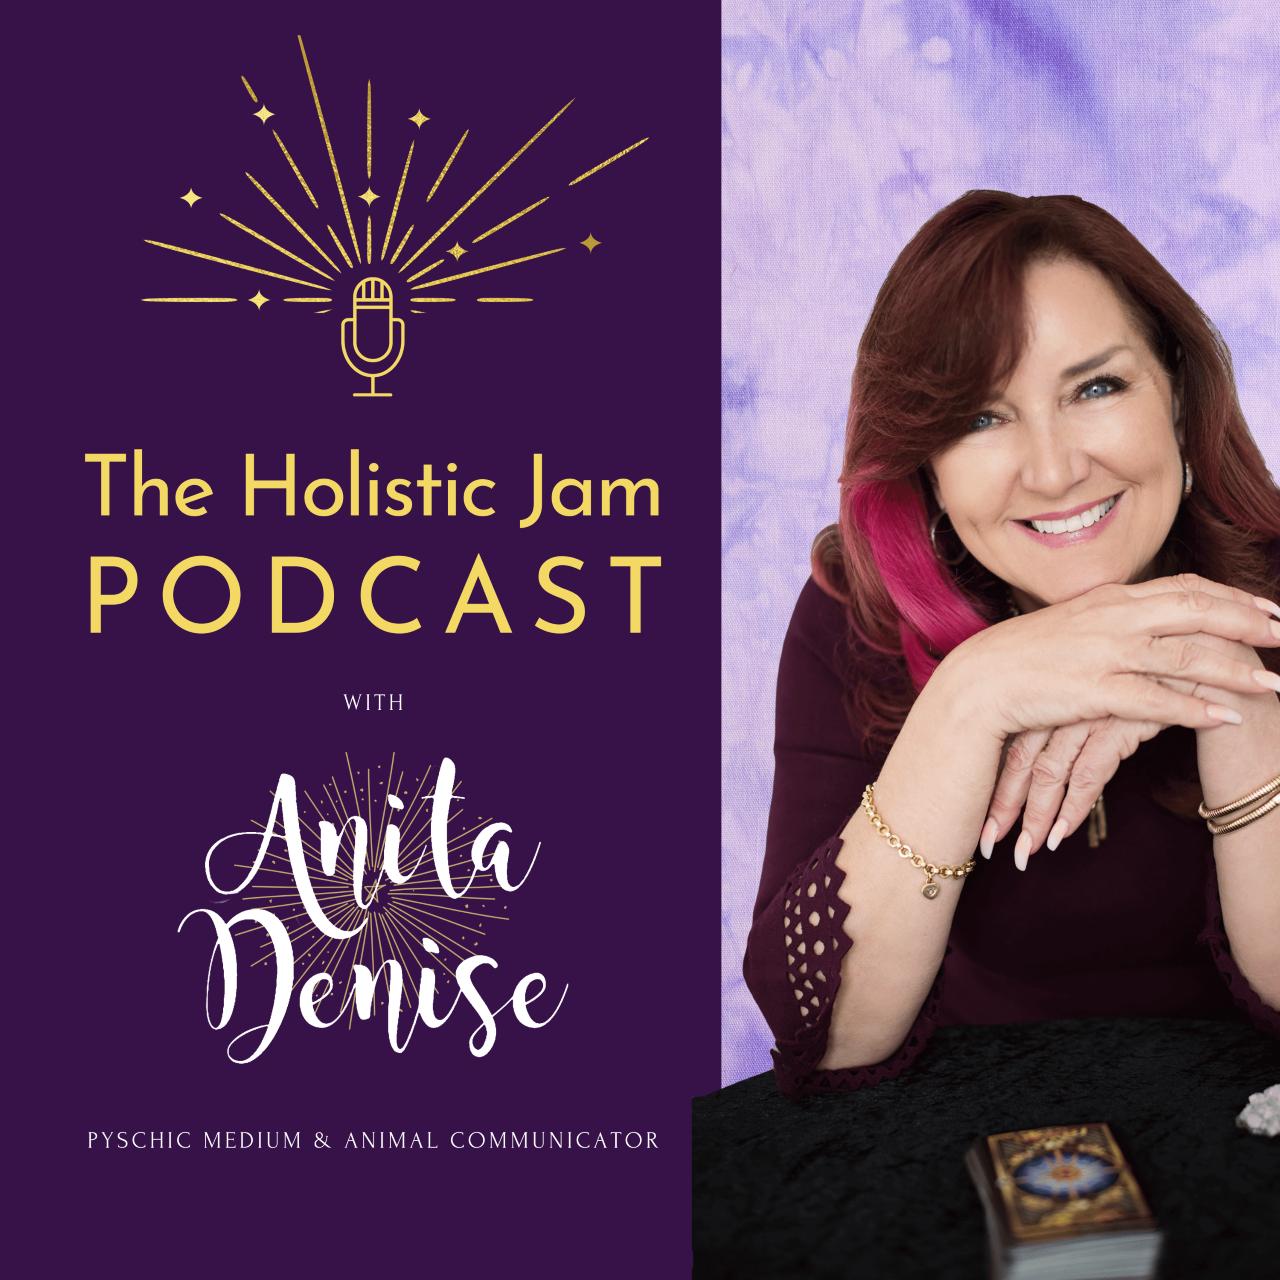 Anita Denise The Holistic Jam Podcast